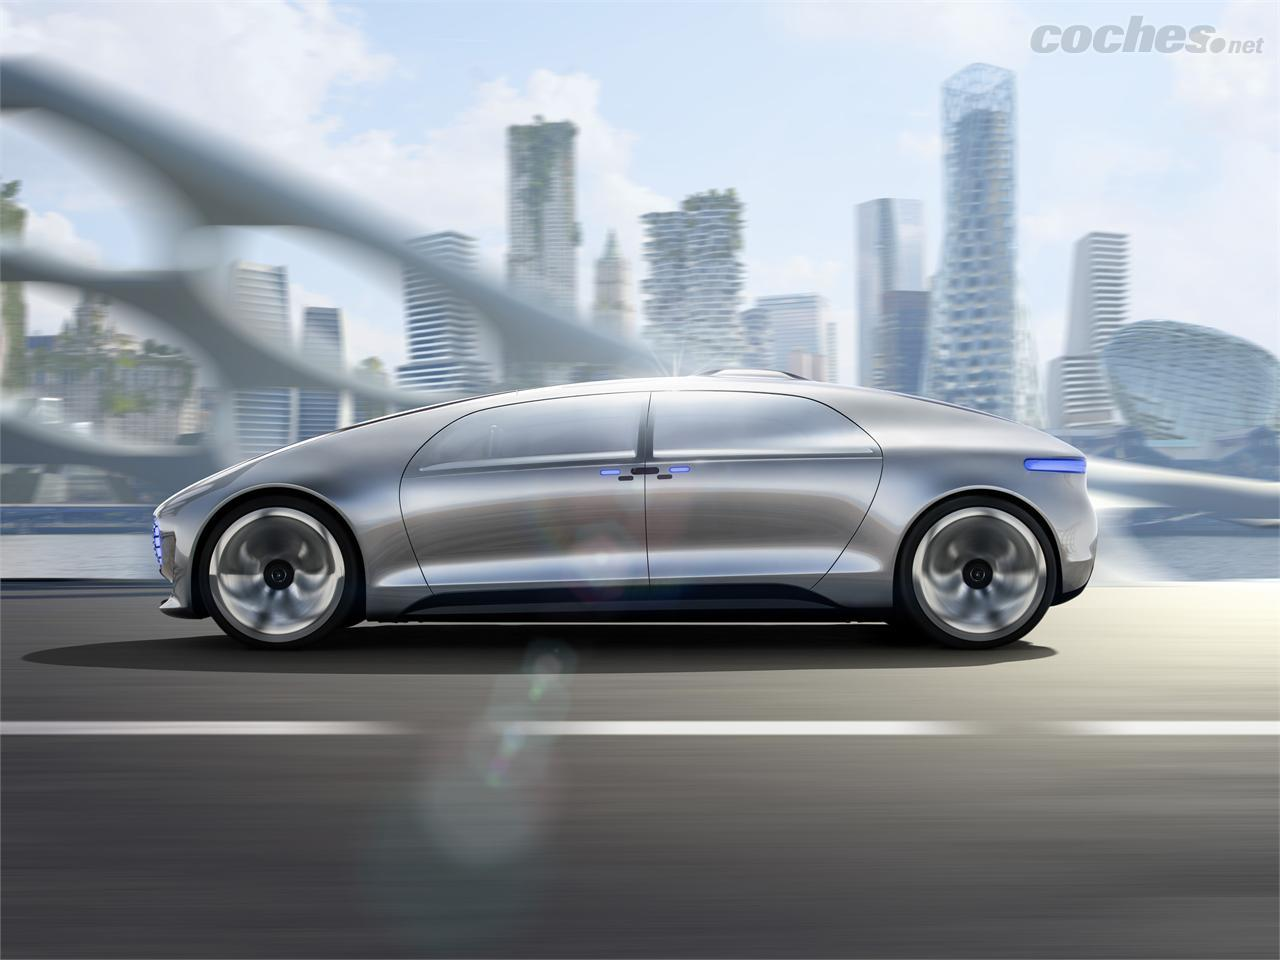 Mindblowing Concept Cars 51 Buick Lesabre Image